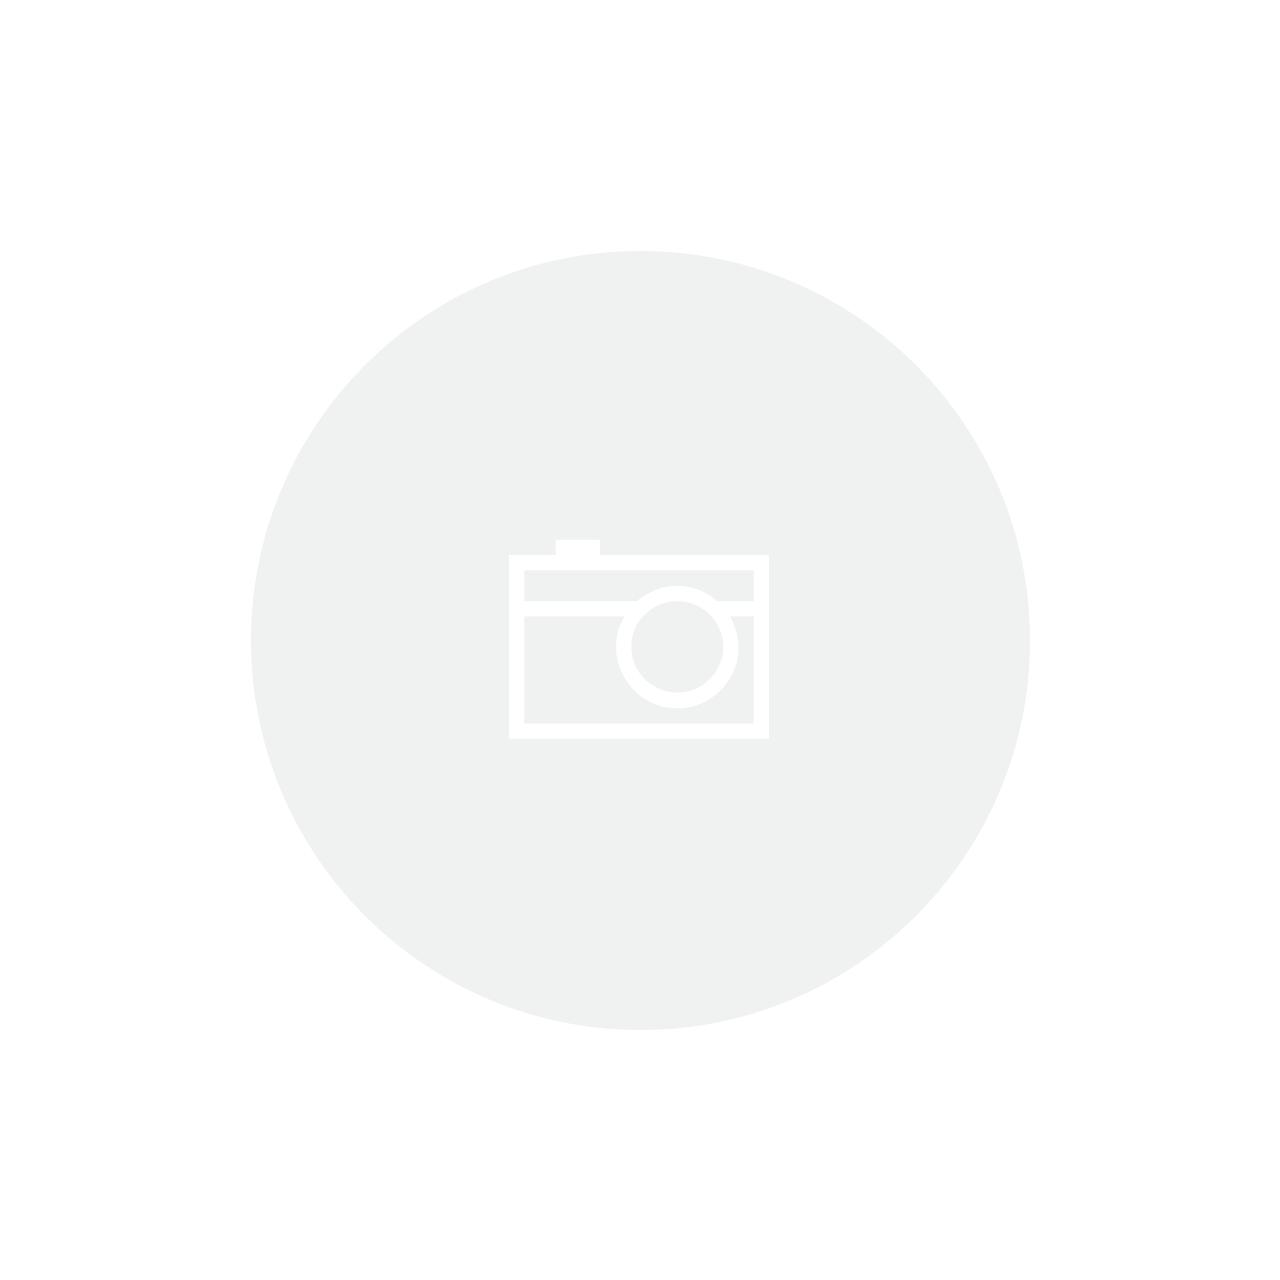 Kit de Lâminas de Tosa 04 Peças - Lâminas de Tosa Oster nº 10, 7F, 40 + Estojo